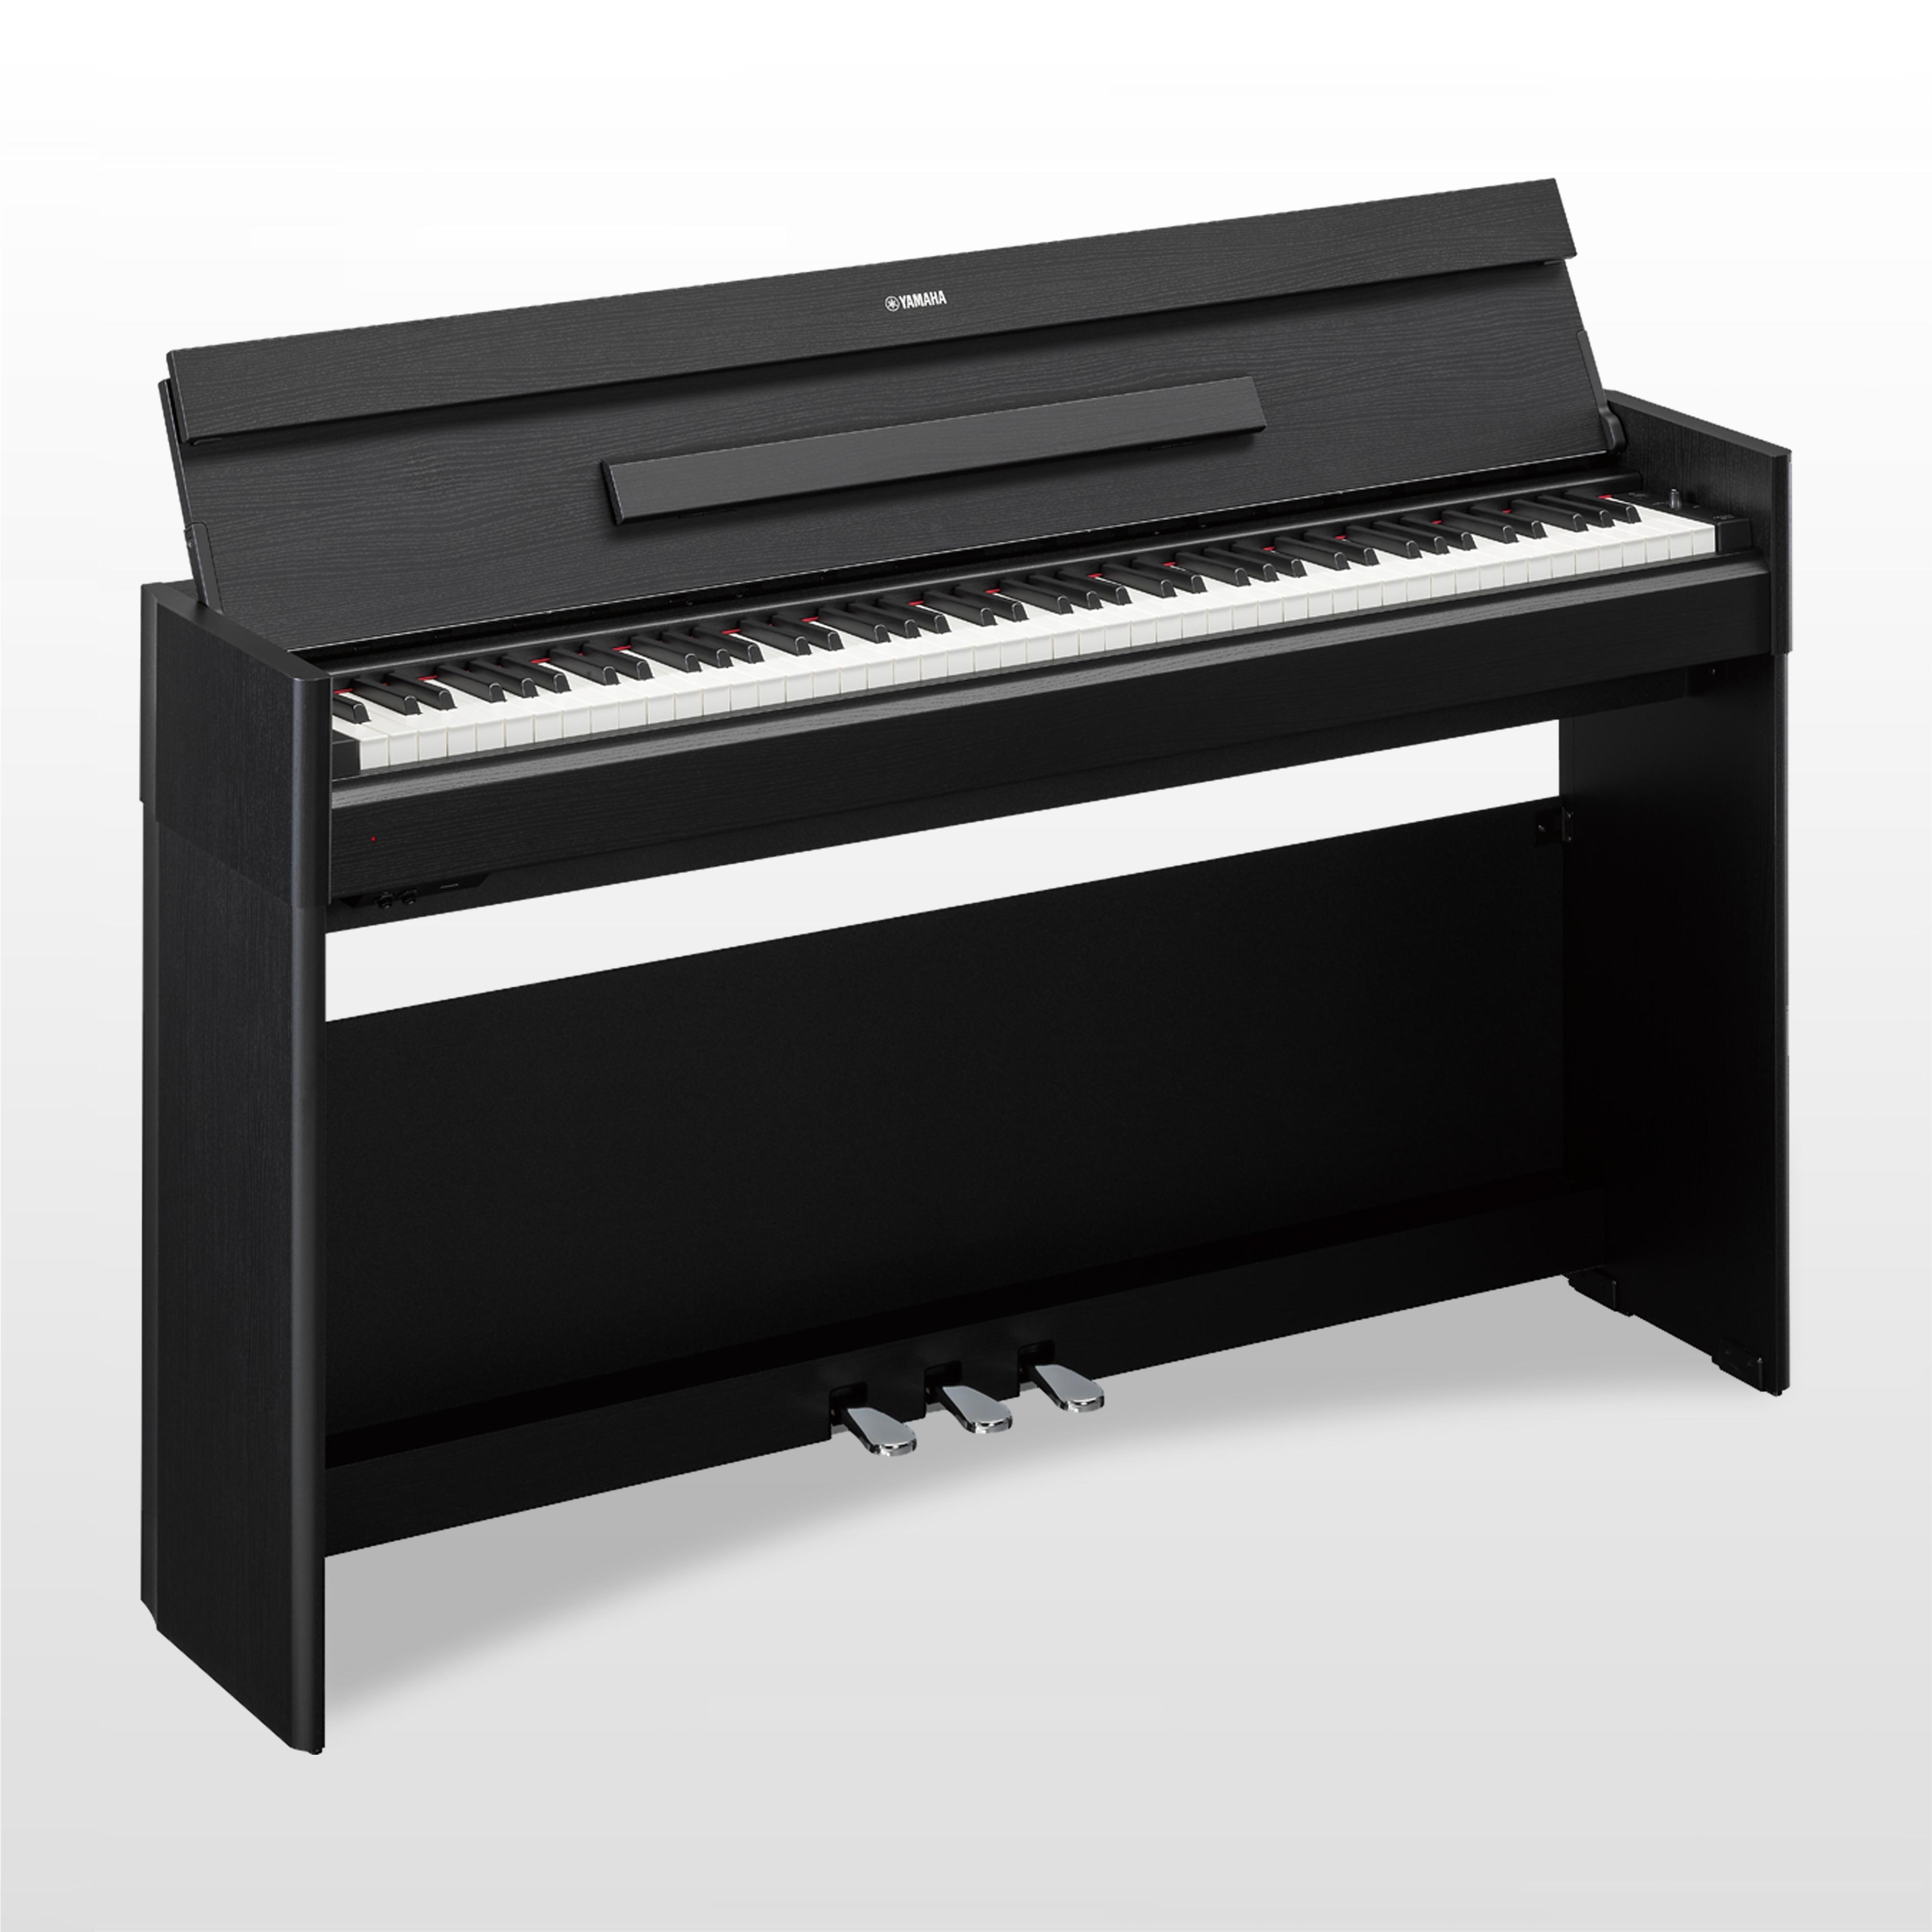 YDP-S54 - Downloads - ARIUS - Pianos - Musikinstrumente ...